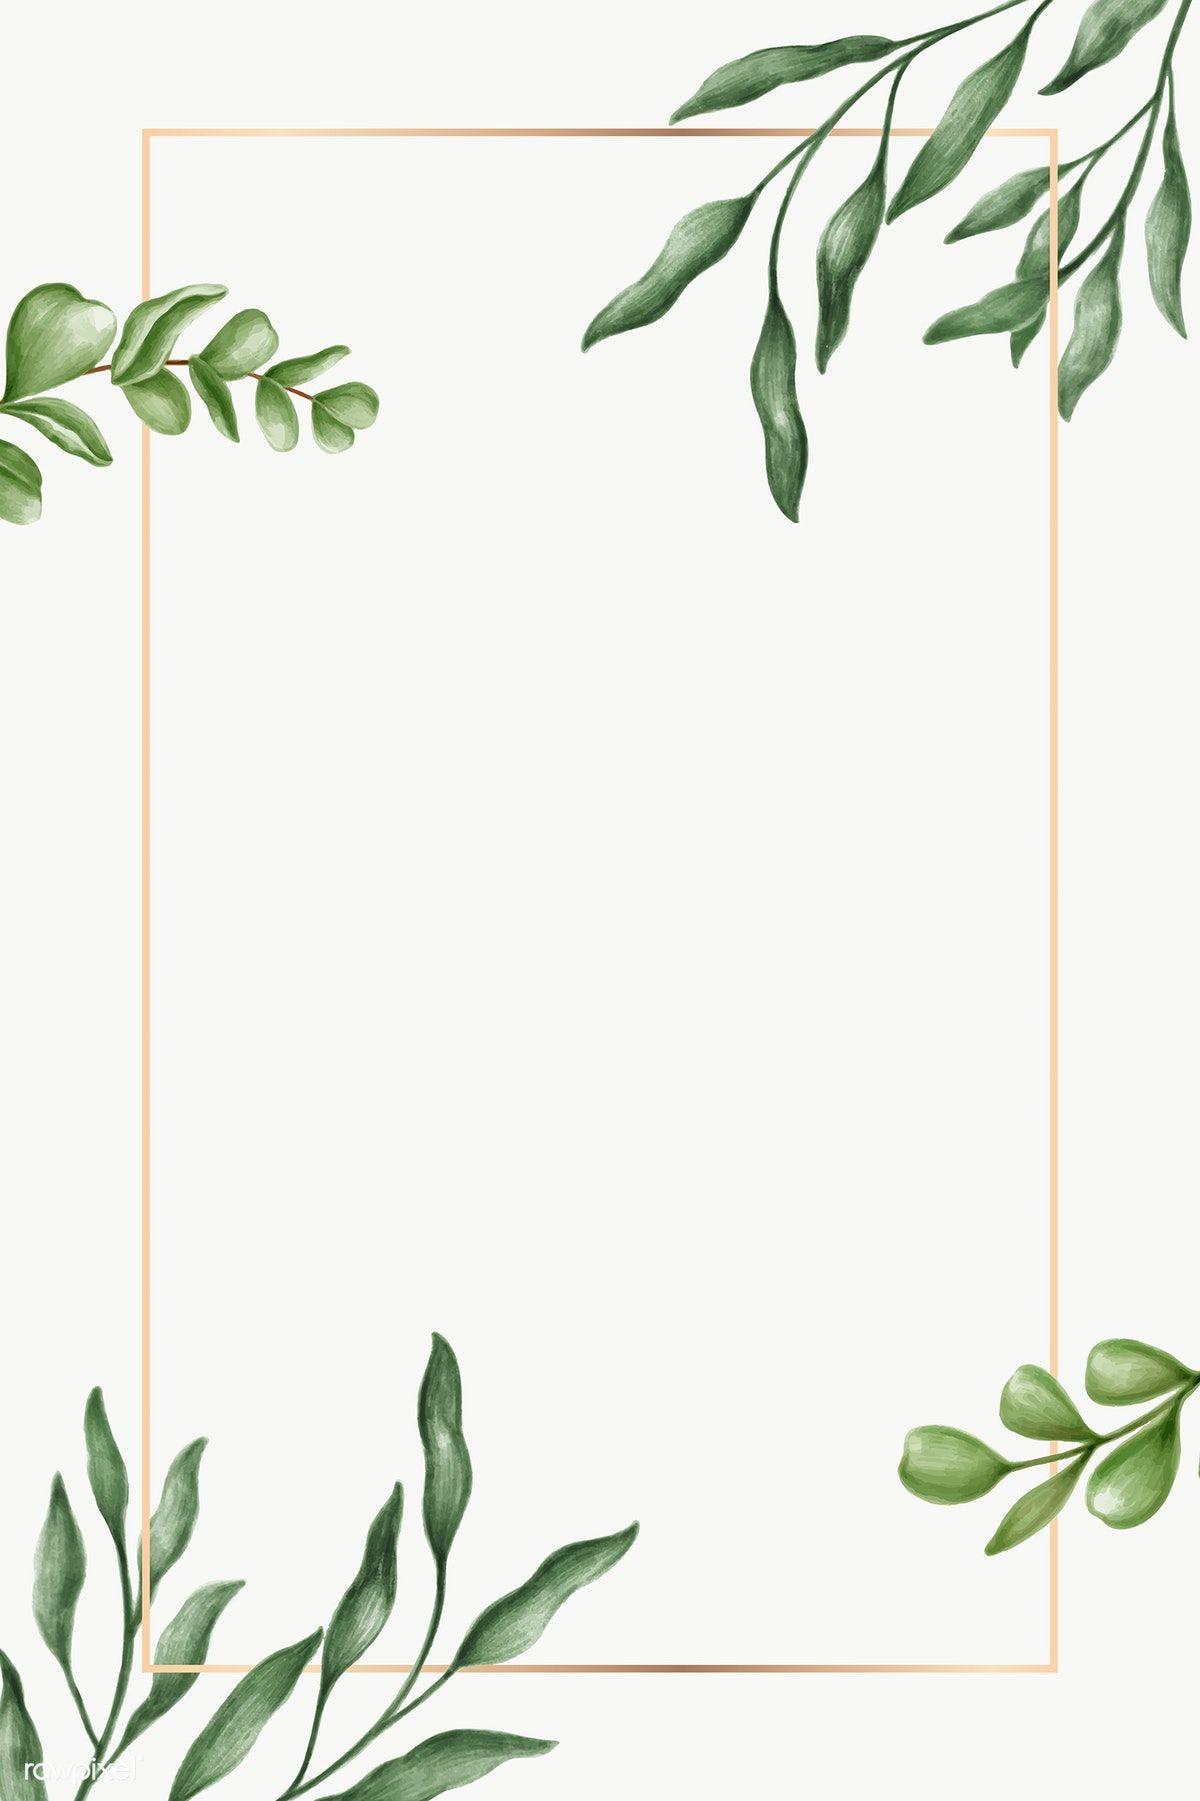 Green Leaves Frame Transparent Png Premium Image By Rawpixel Com Noon Vector Vectorart Digitalpainting Zelenye Fony Cvetochnye Fony Illyustracii Rastenij